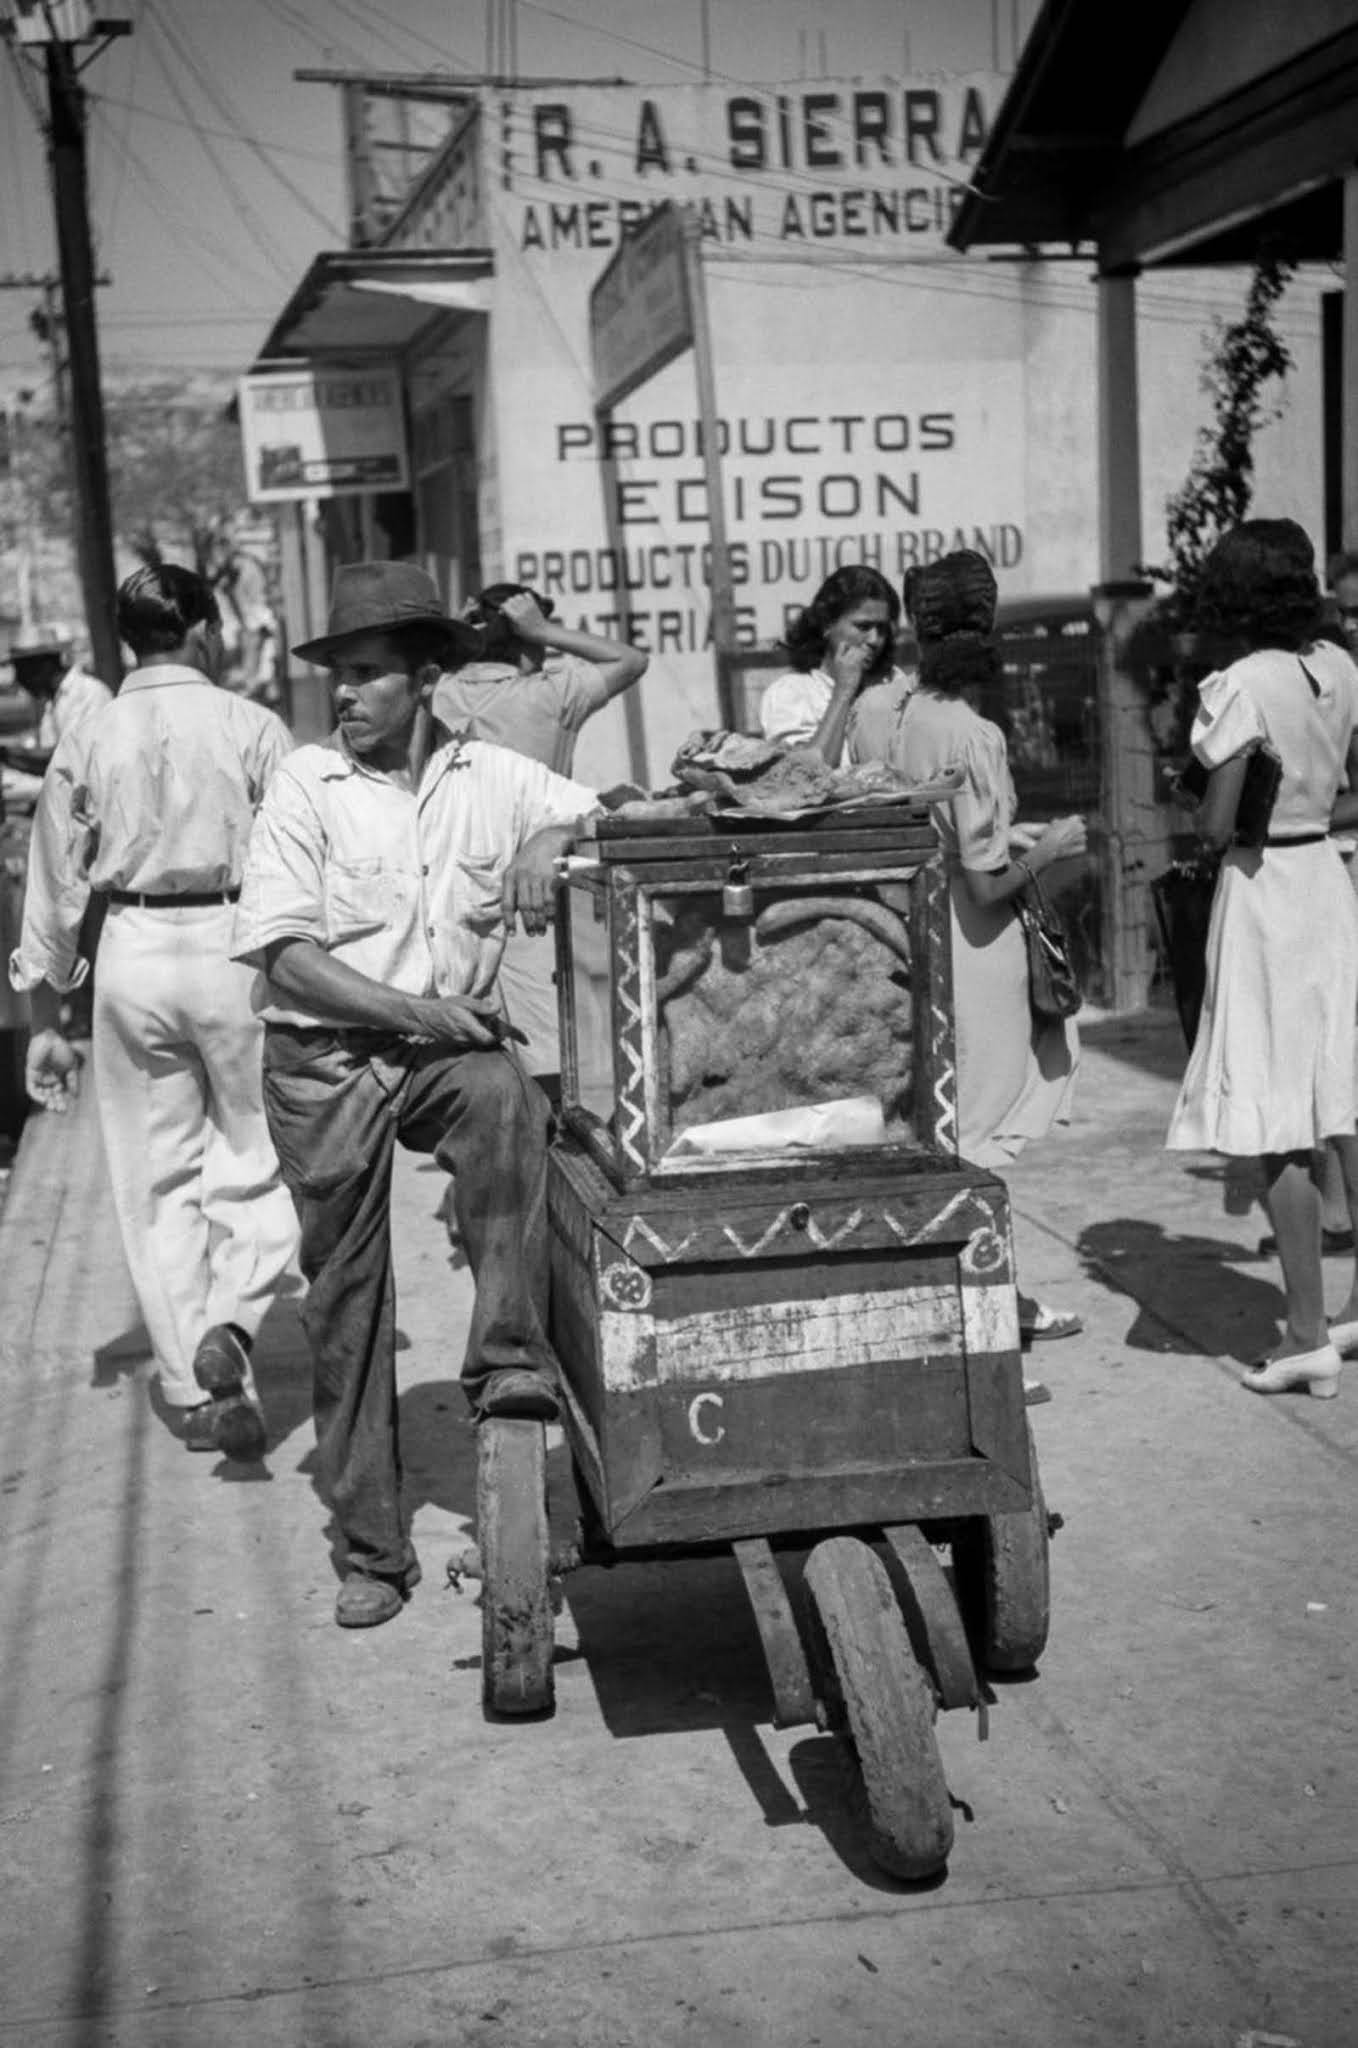 A street vendor in Santurce.